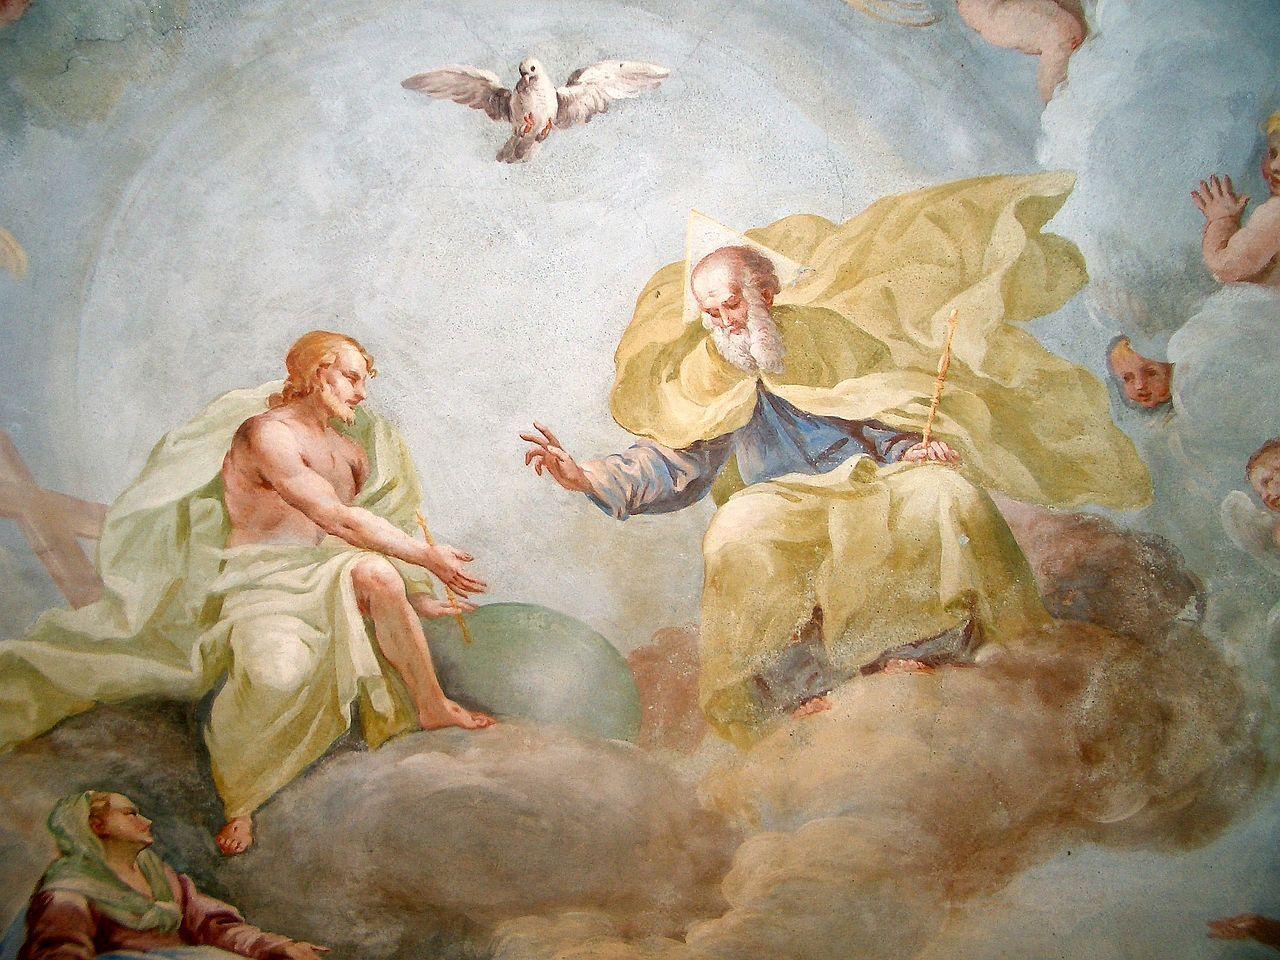 The Holy Trinity by Luca Rossetti da Orta Holy spirit